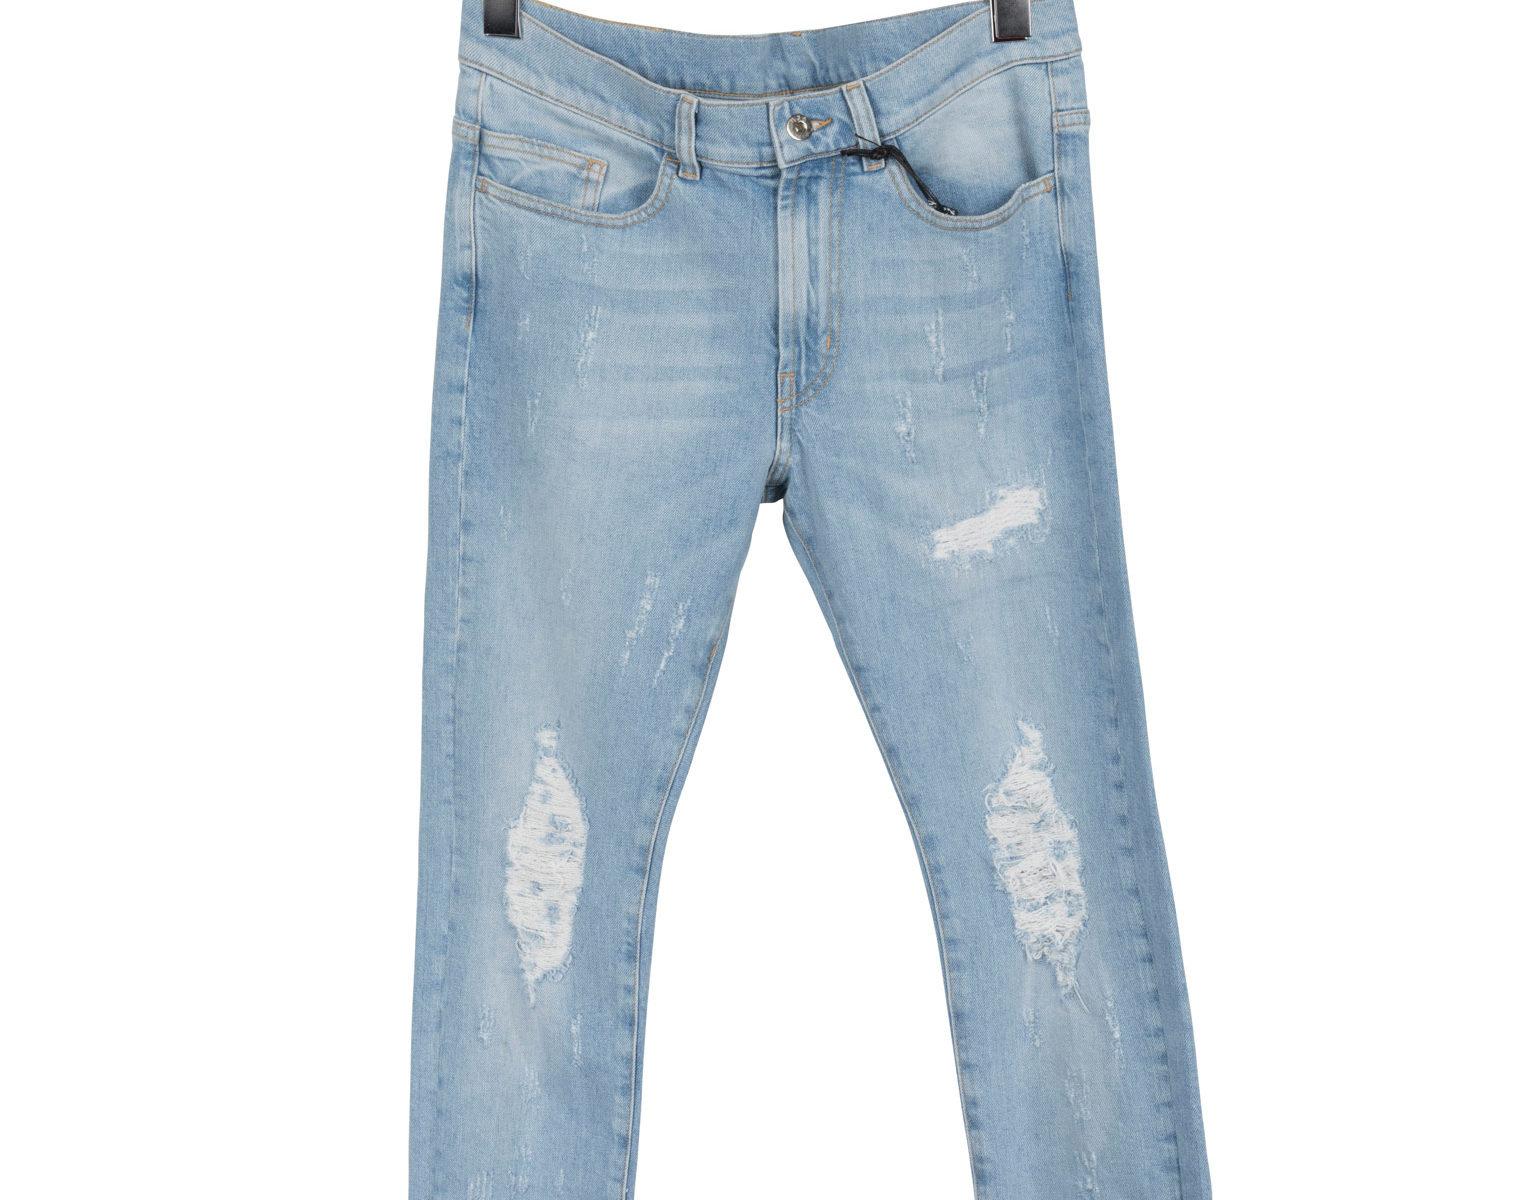 MJB Crixus Jeans 1